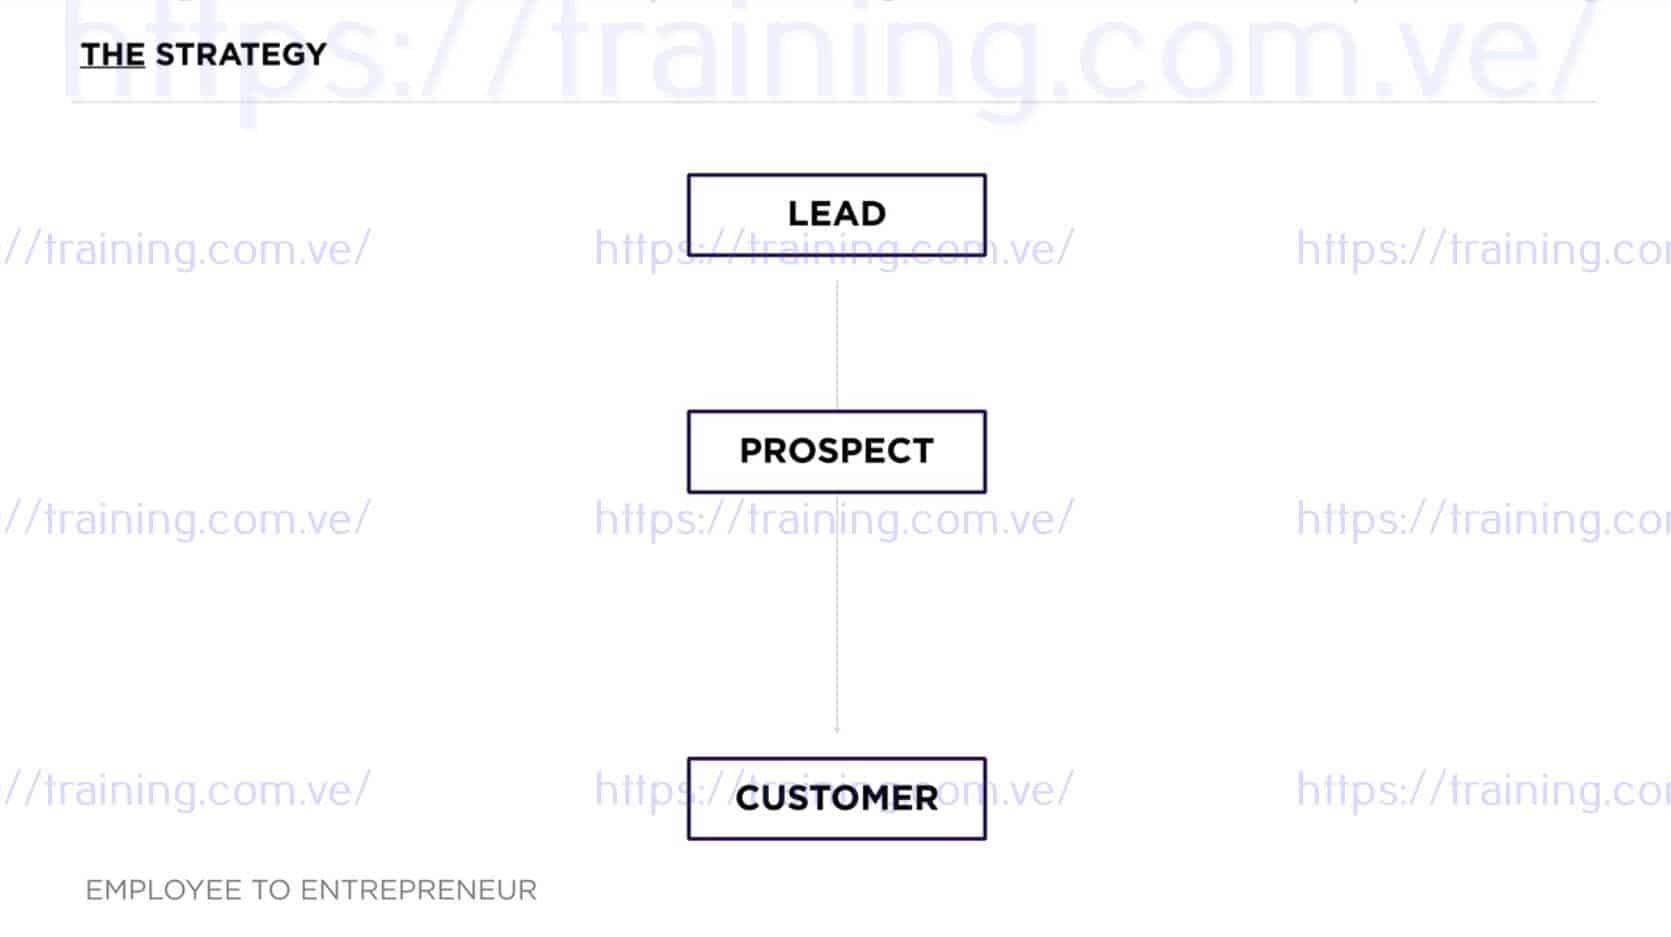 Employee to Entrepreneur LIVE 2.0 by Luisa Zhou 2